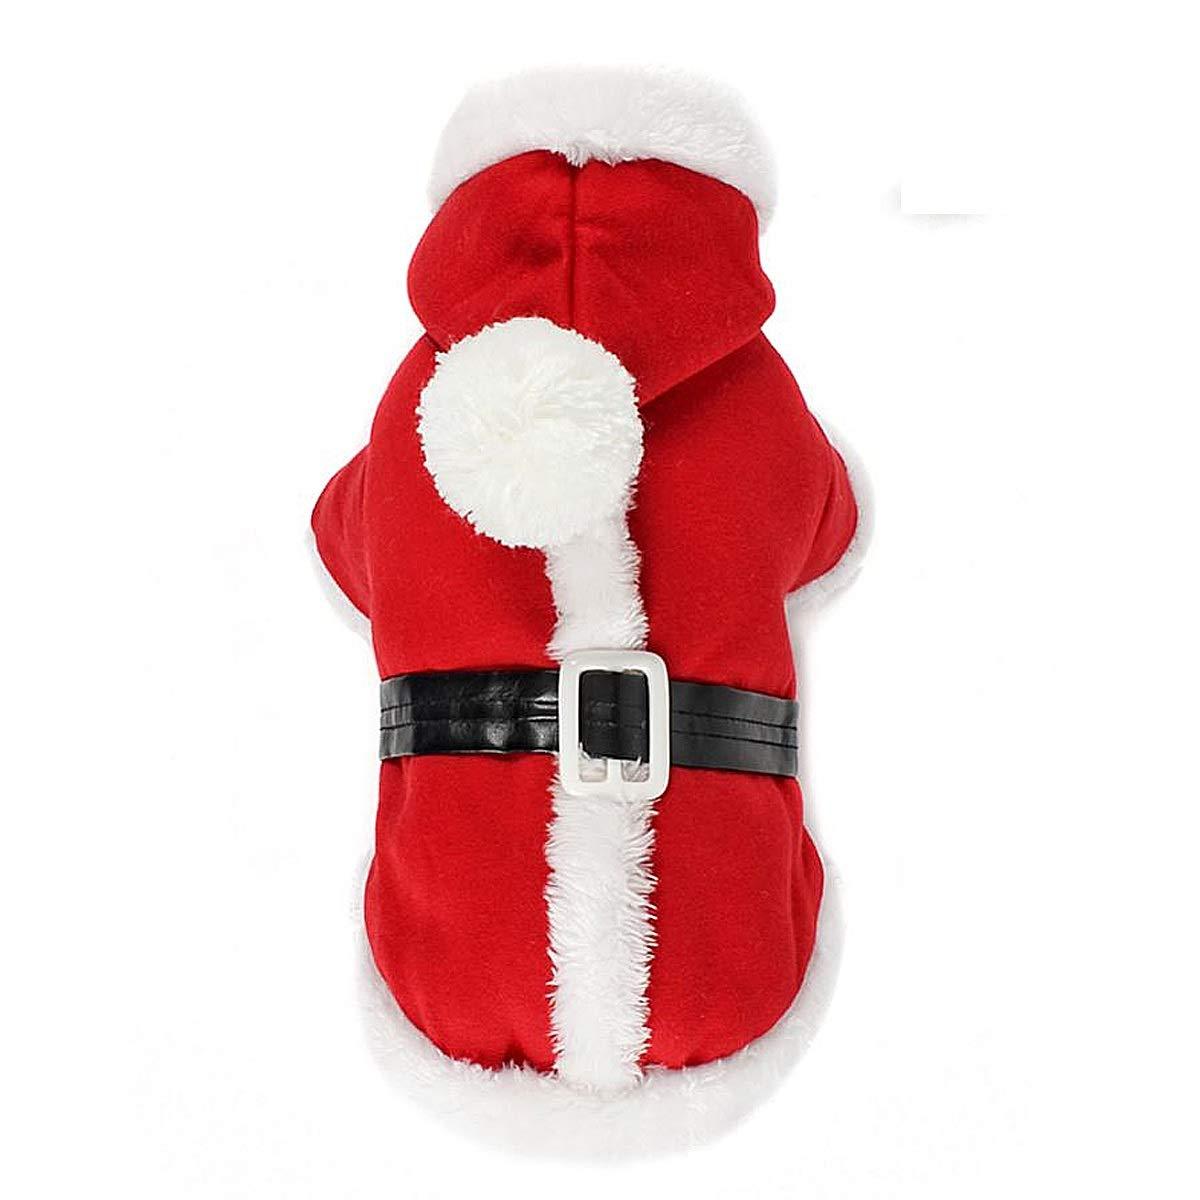 Puppy Dog Christmas Coat Doggy Santa Costume Outfit with a LED Flashing Dog Tag PETLESO Dog Santa Costume